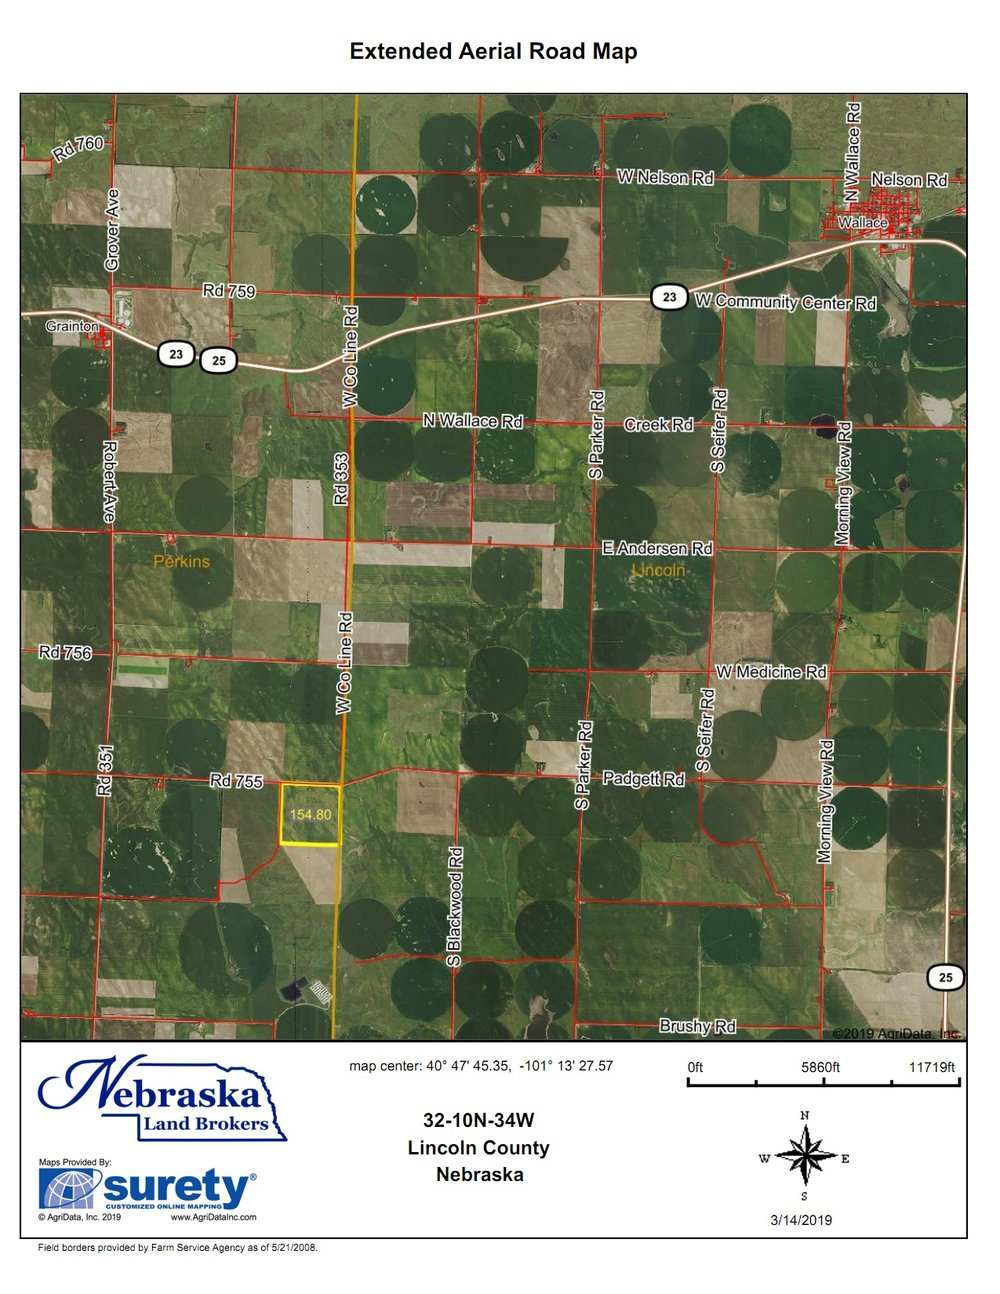 Extended Aerial Road Map.jpg